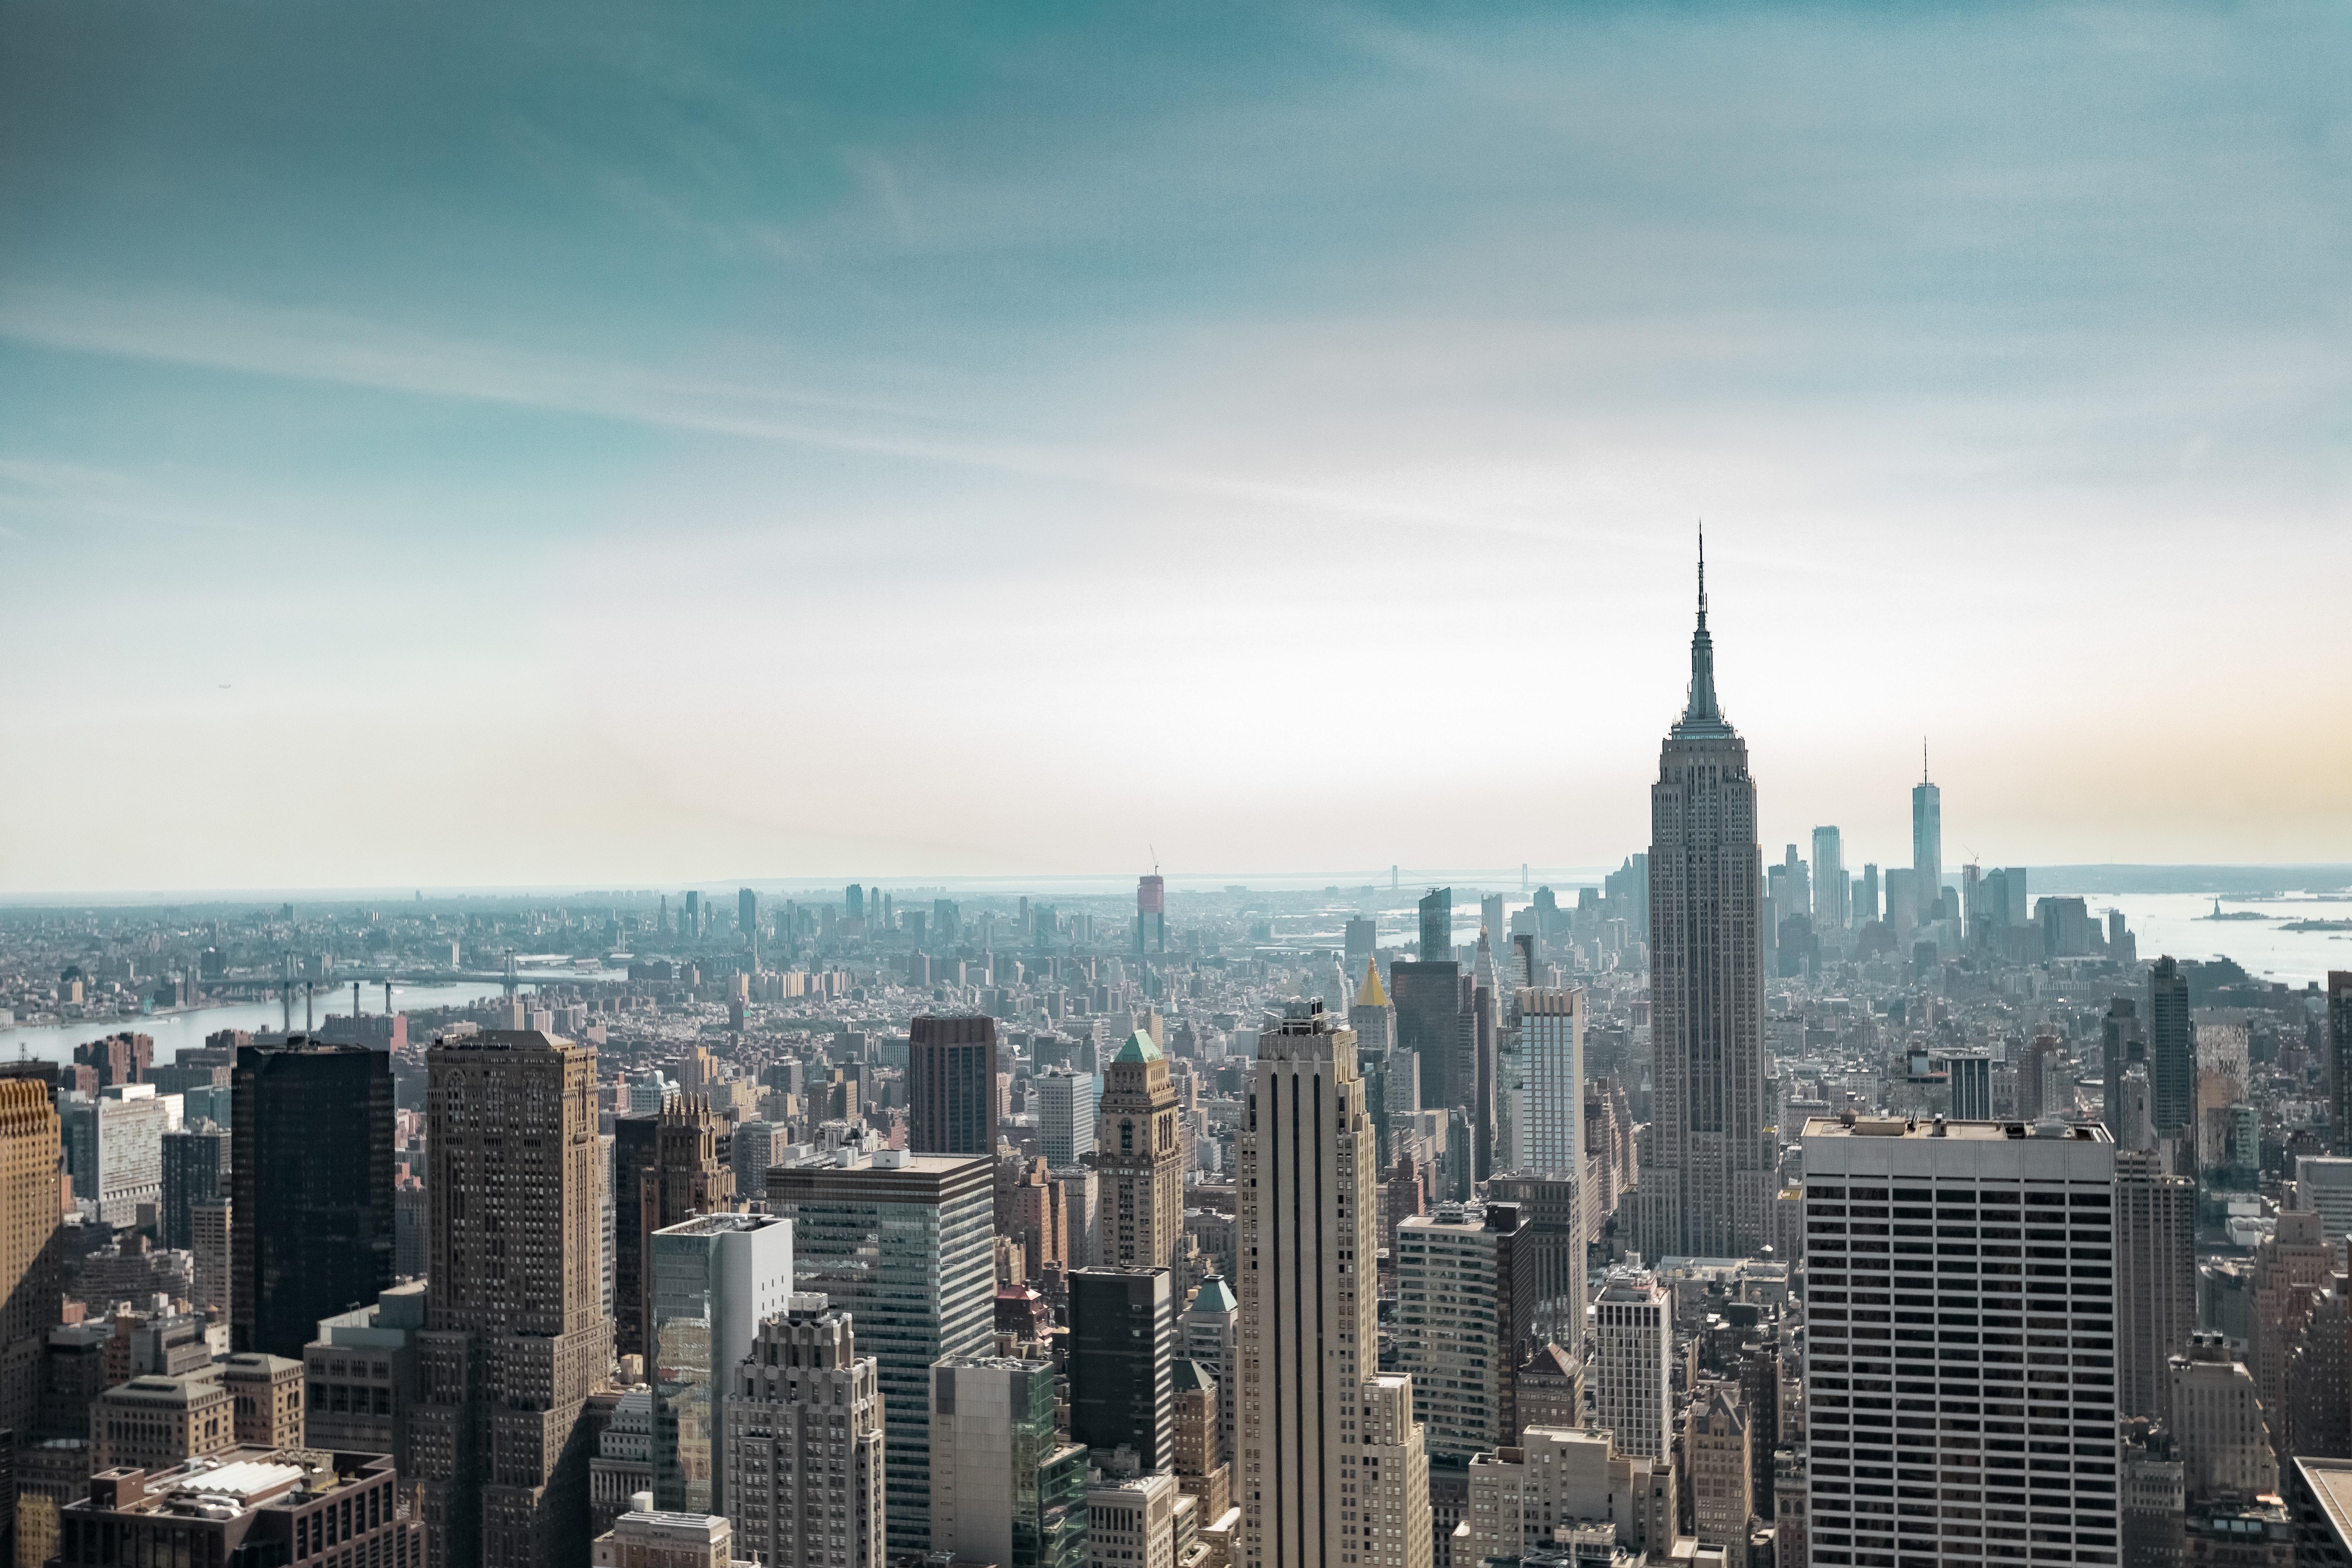 dorian mongel 9zQkRU9IsDk unsplash - New York Fourth Department Win on Personal Jurisdiction in Benzene Case